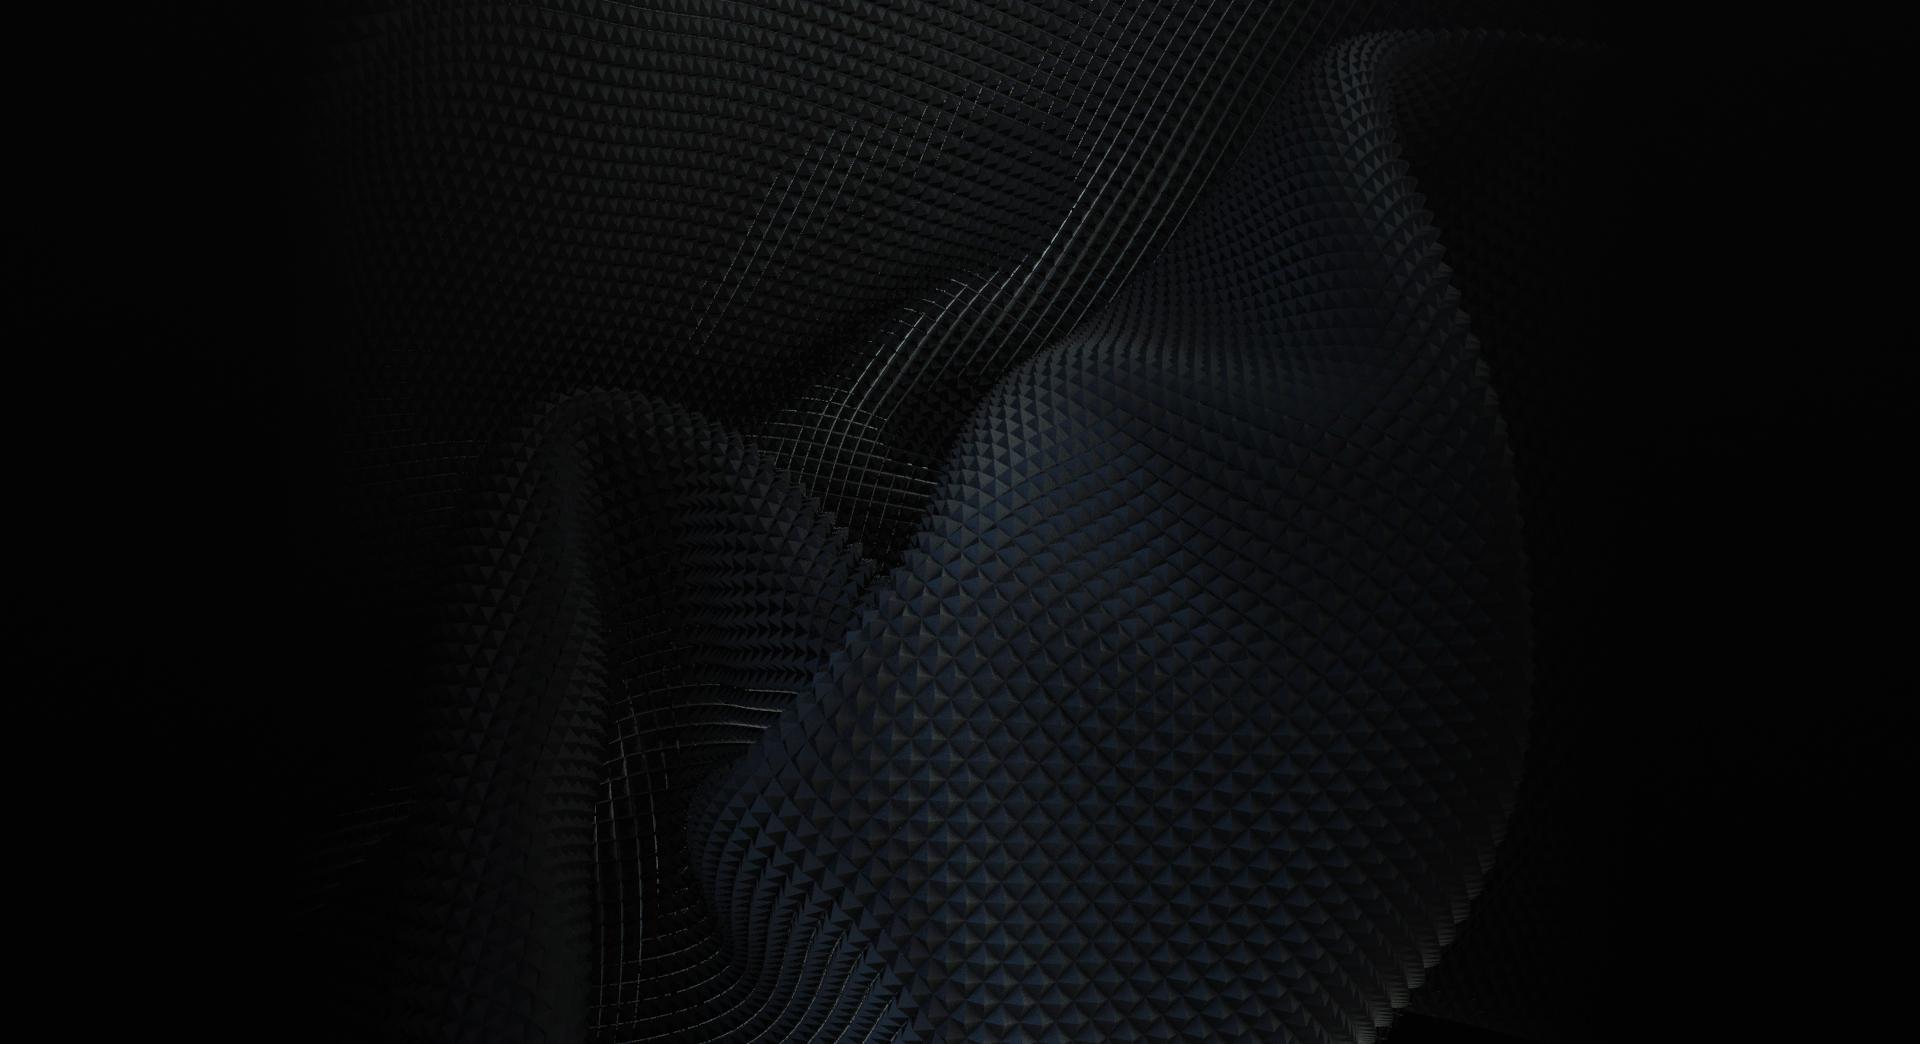 Micromesh_Desktop Background_02.jpg